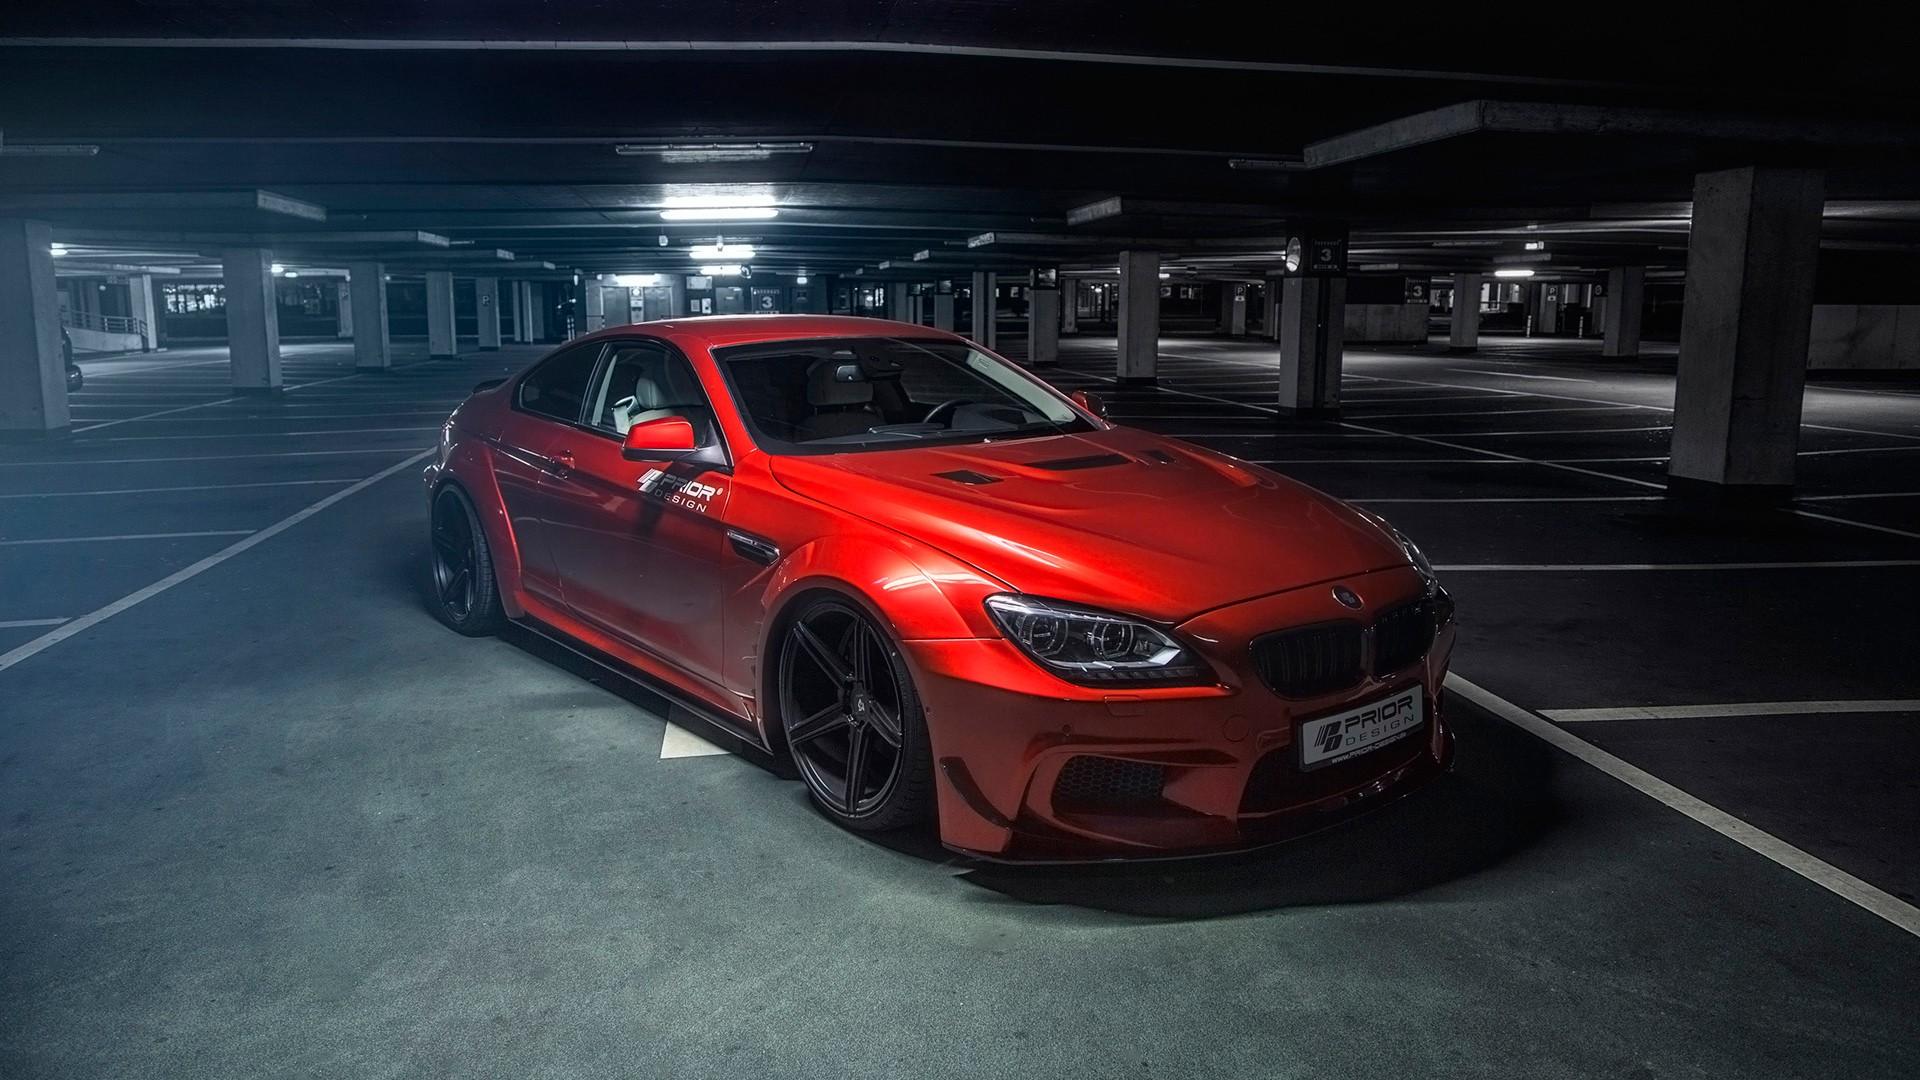 BMW M6 Gran Coupe >> Prior Design BMW 6 Series 2014 Wallpaper | HD Car ...